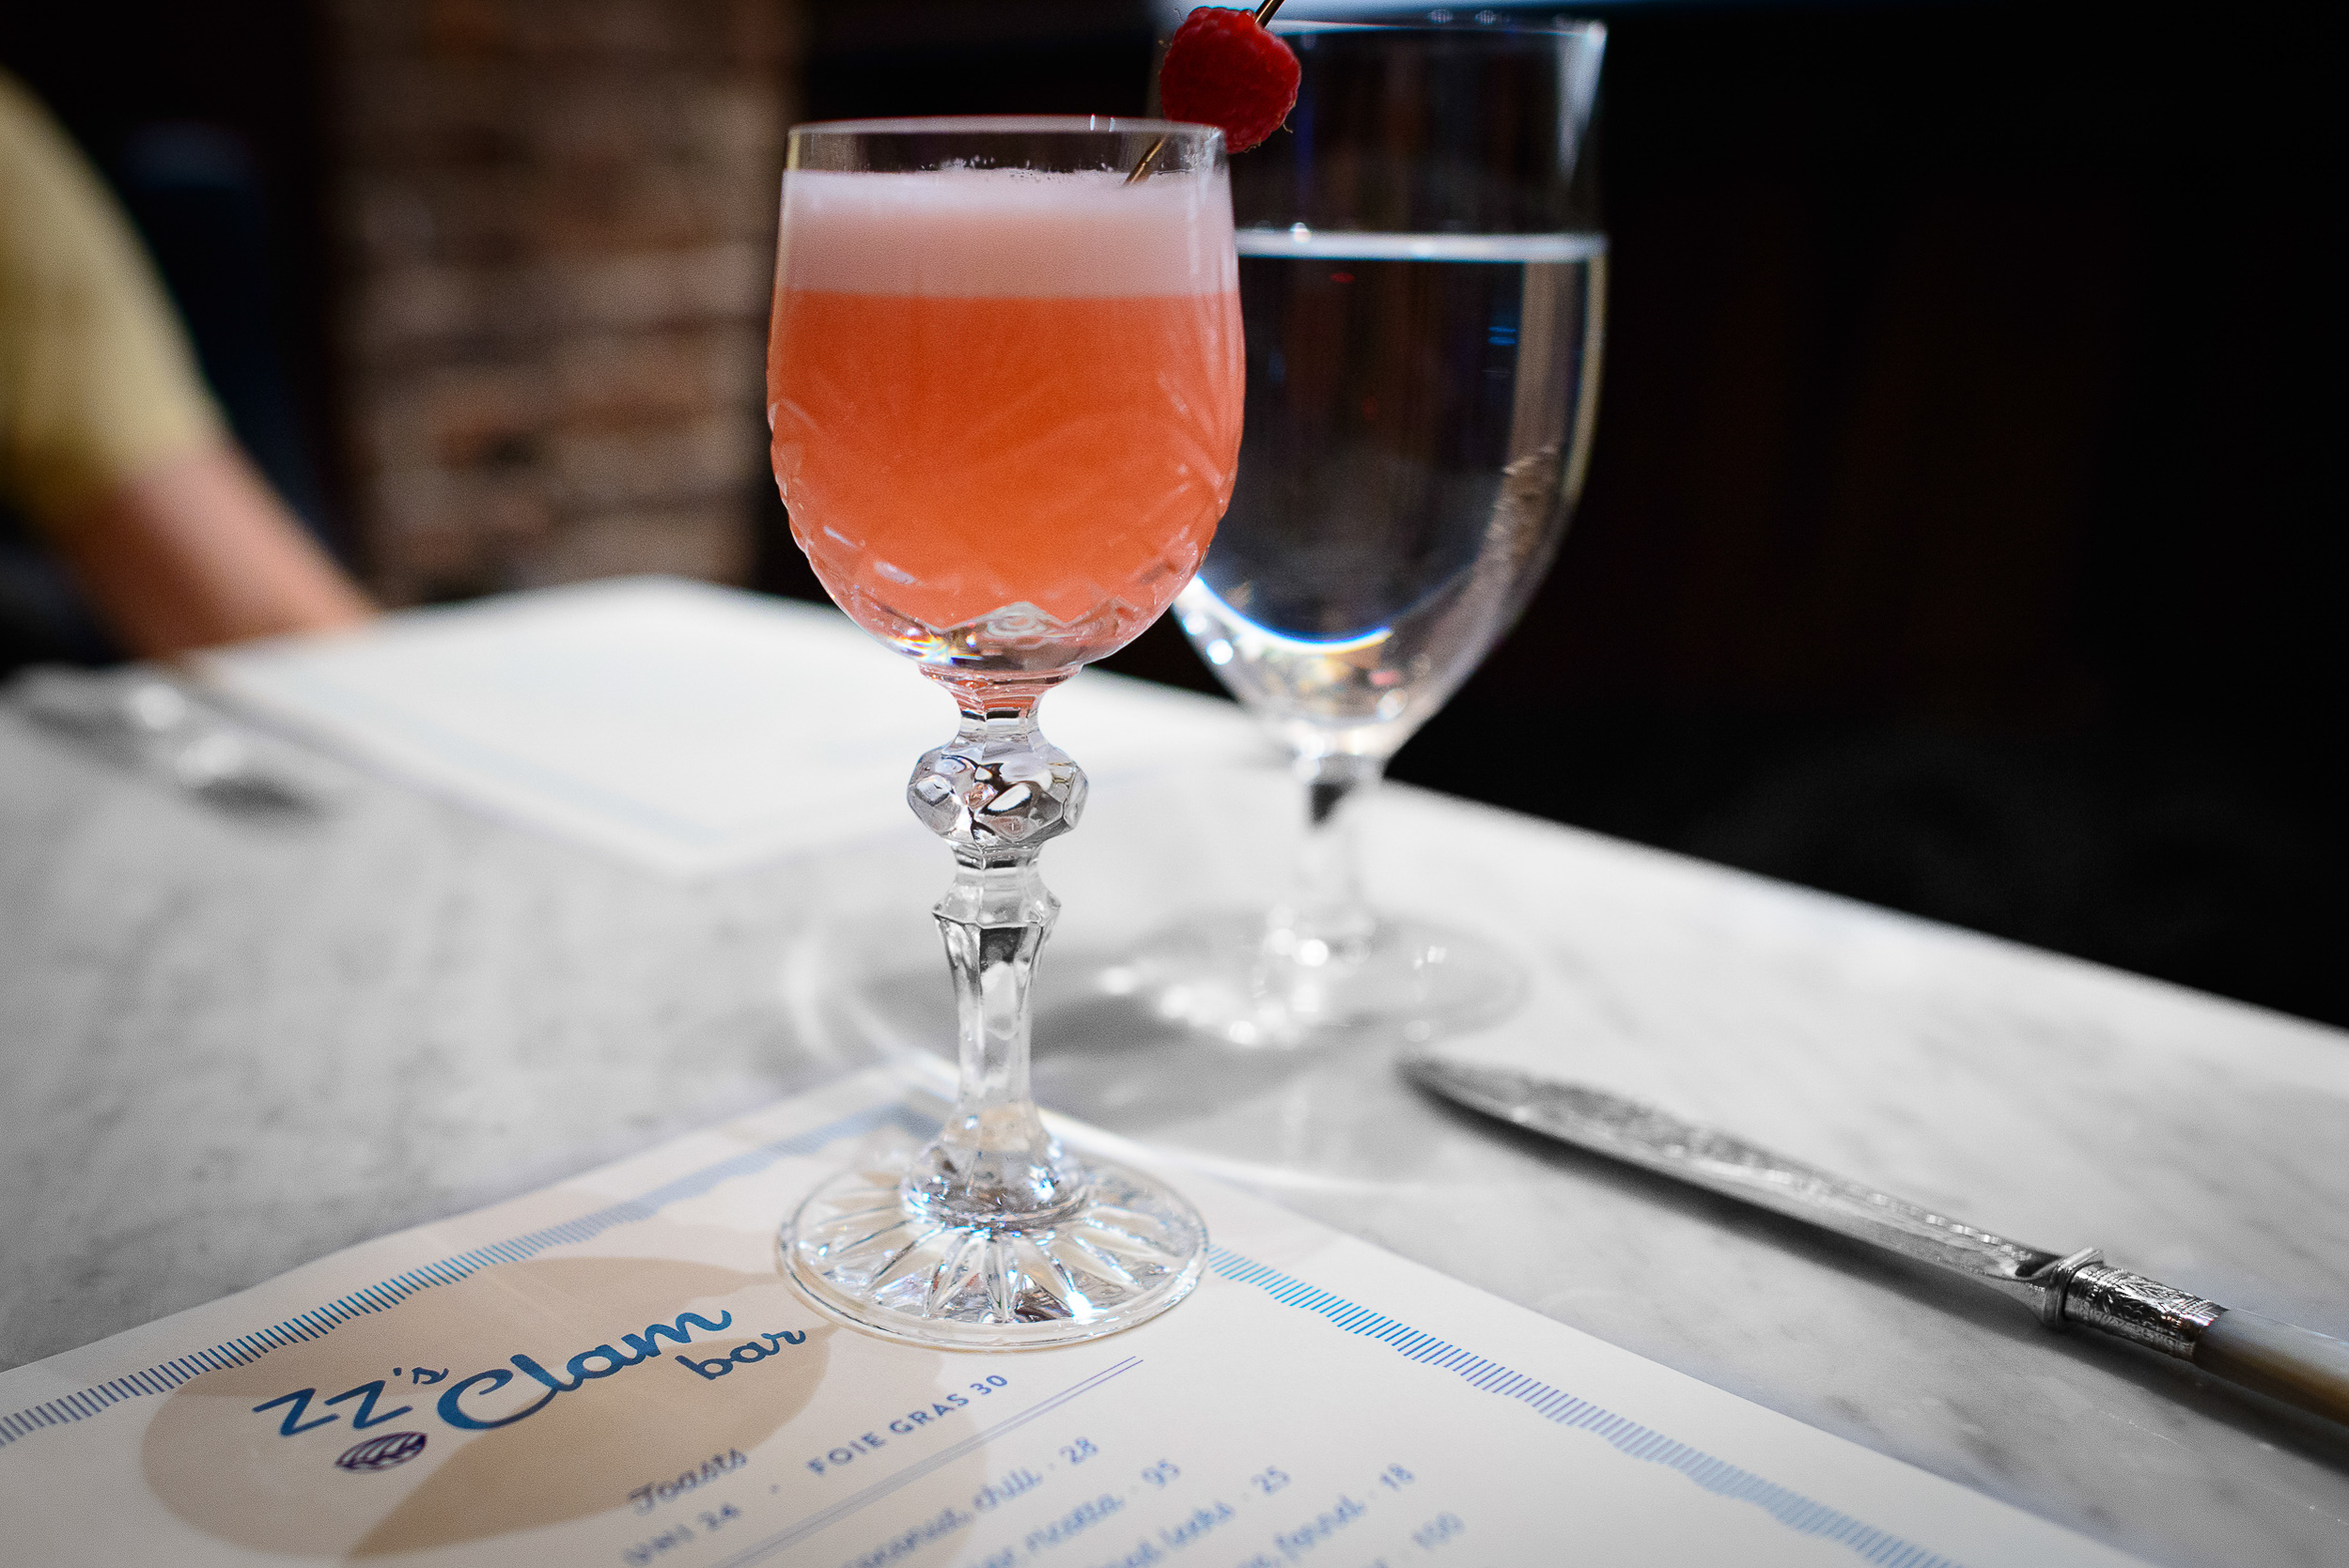 Strawberry: dry gin, rosemary vermouth, kalamansi